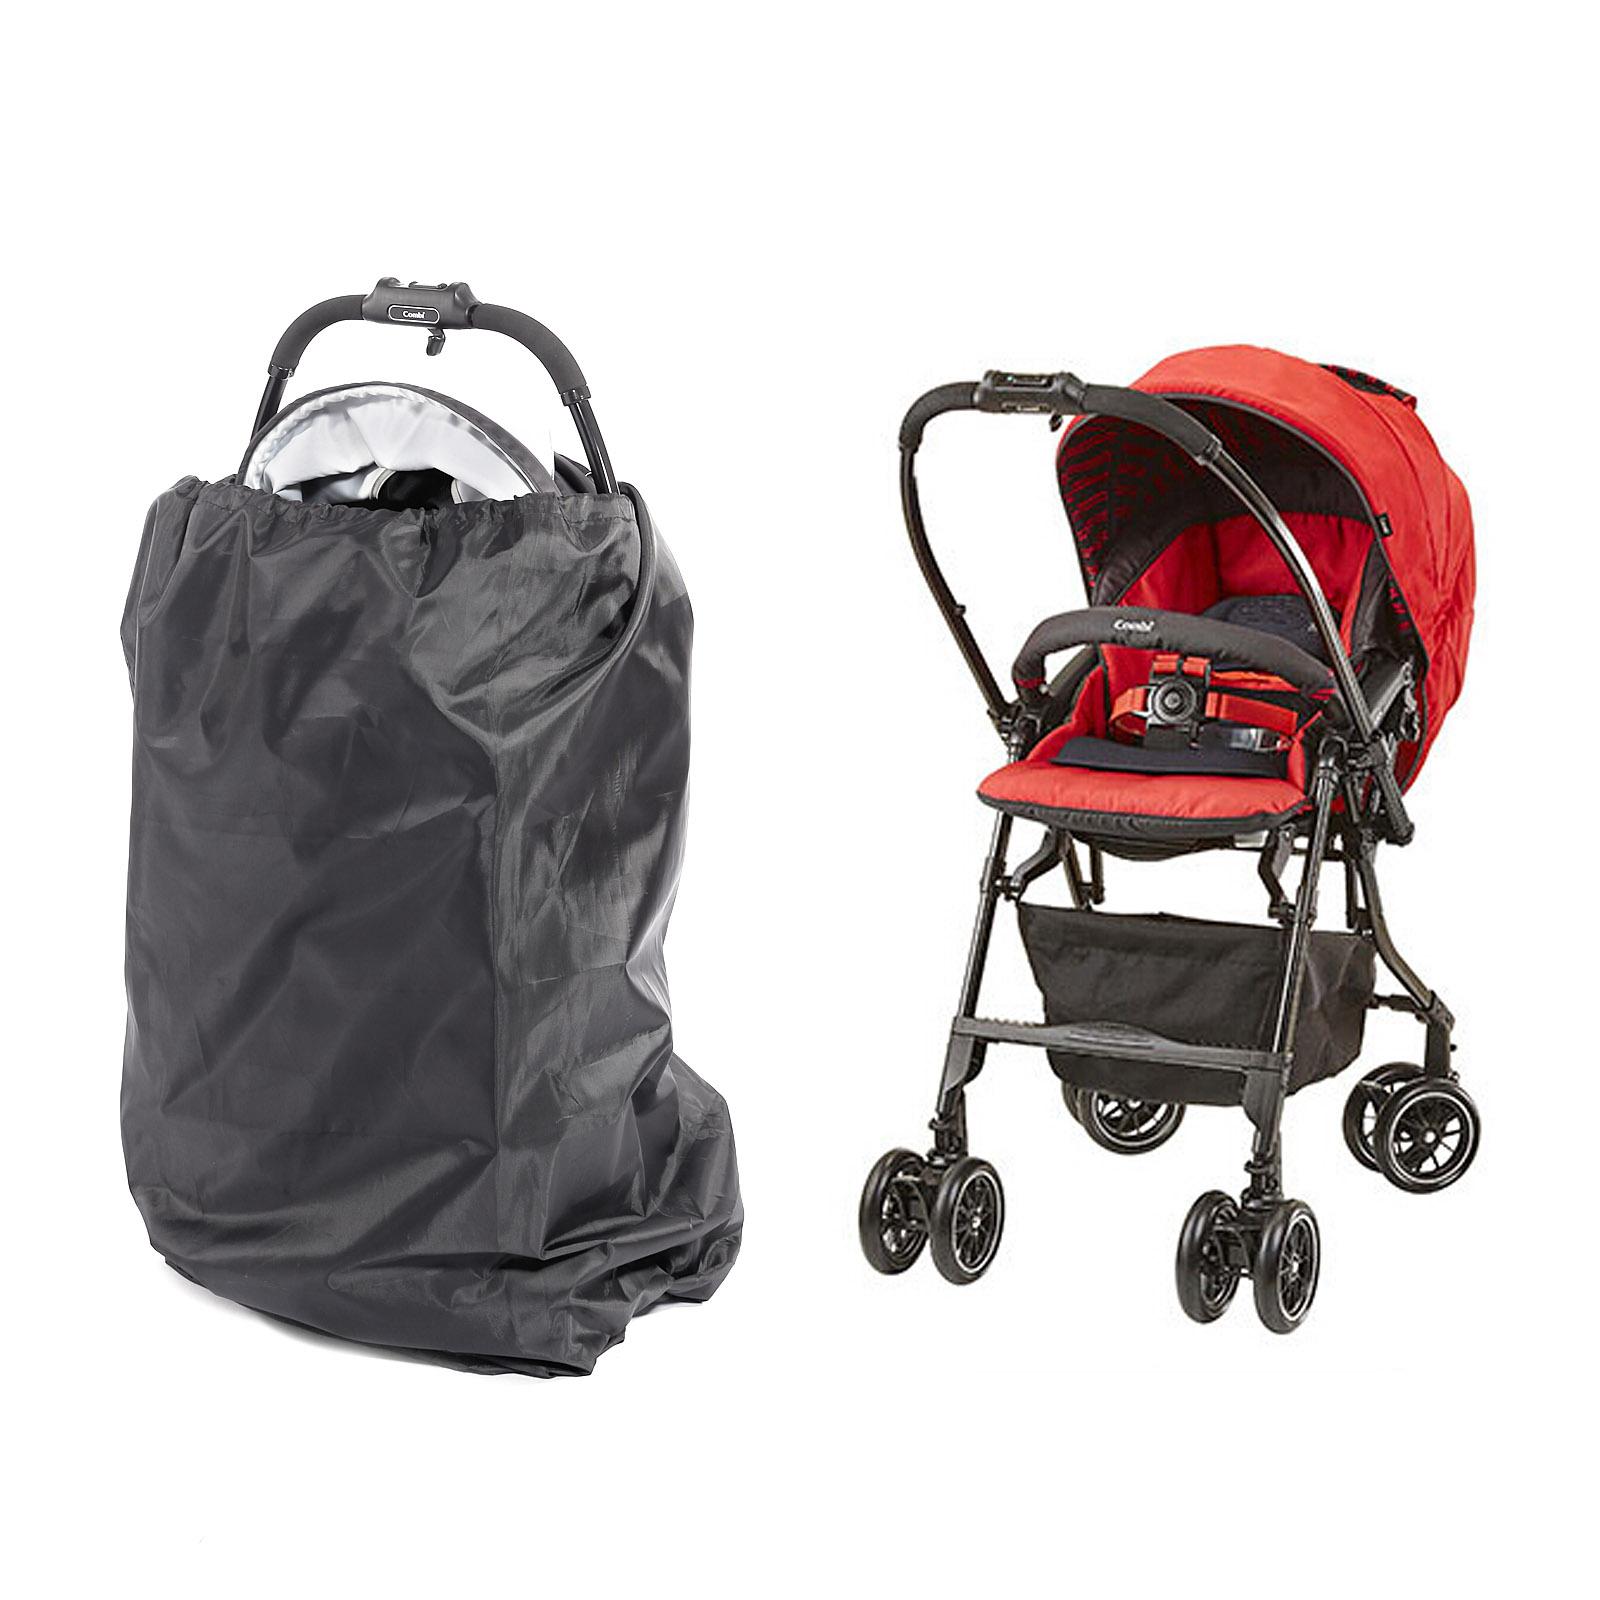 Funda Cubierta de Transporte Viaje para Carrito de Beb Silla de